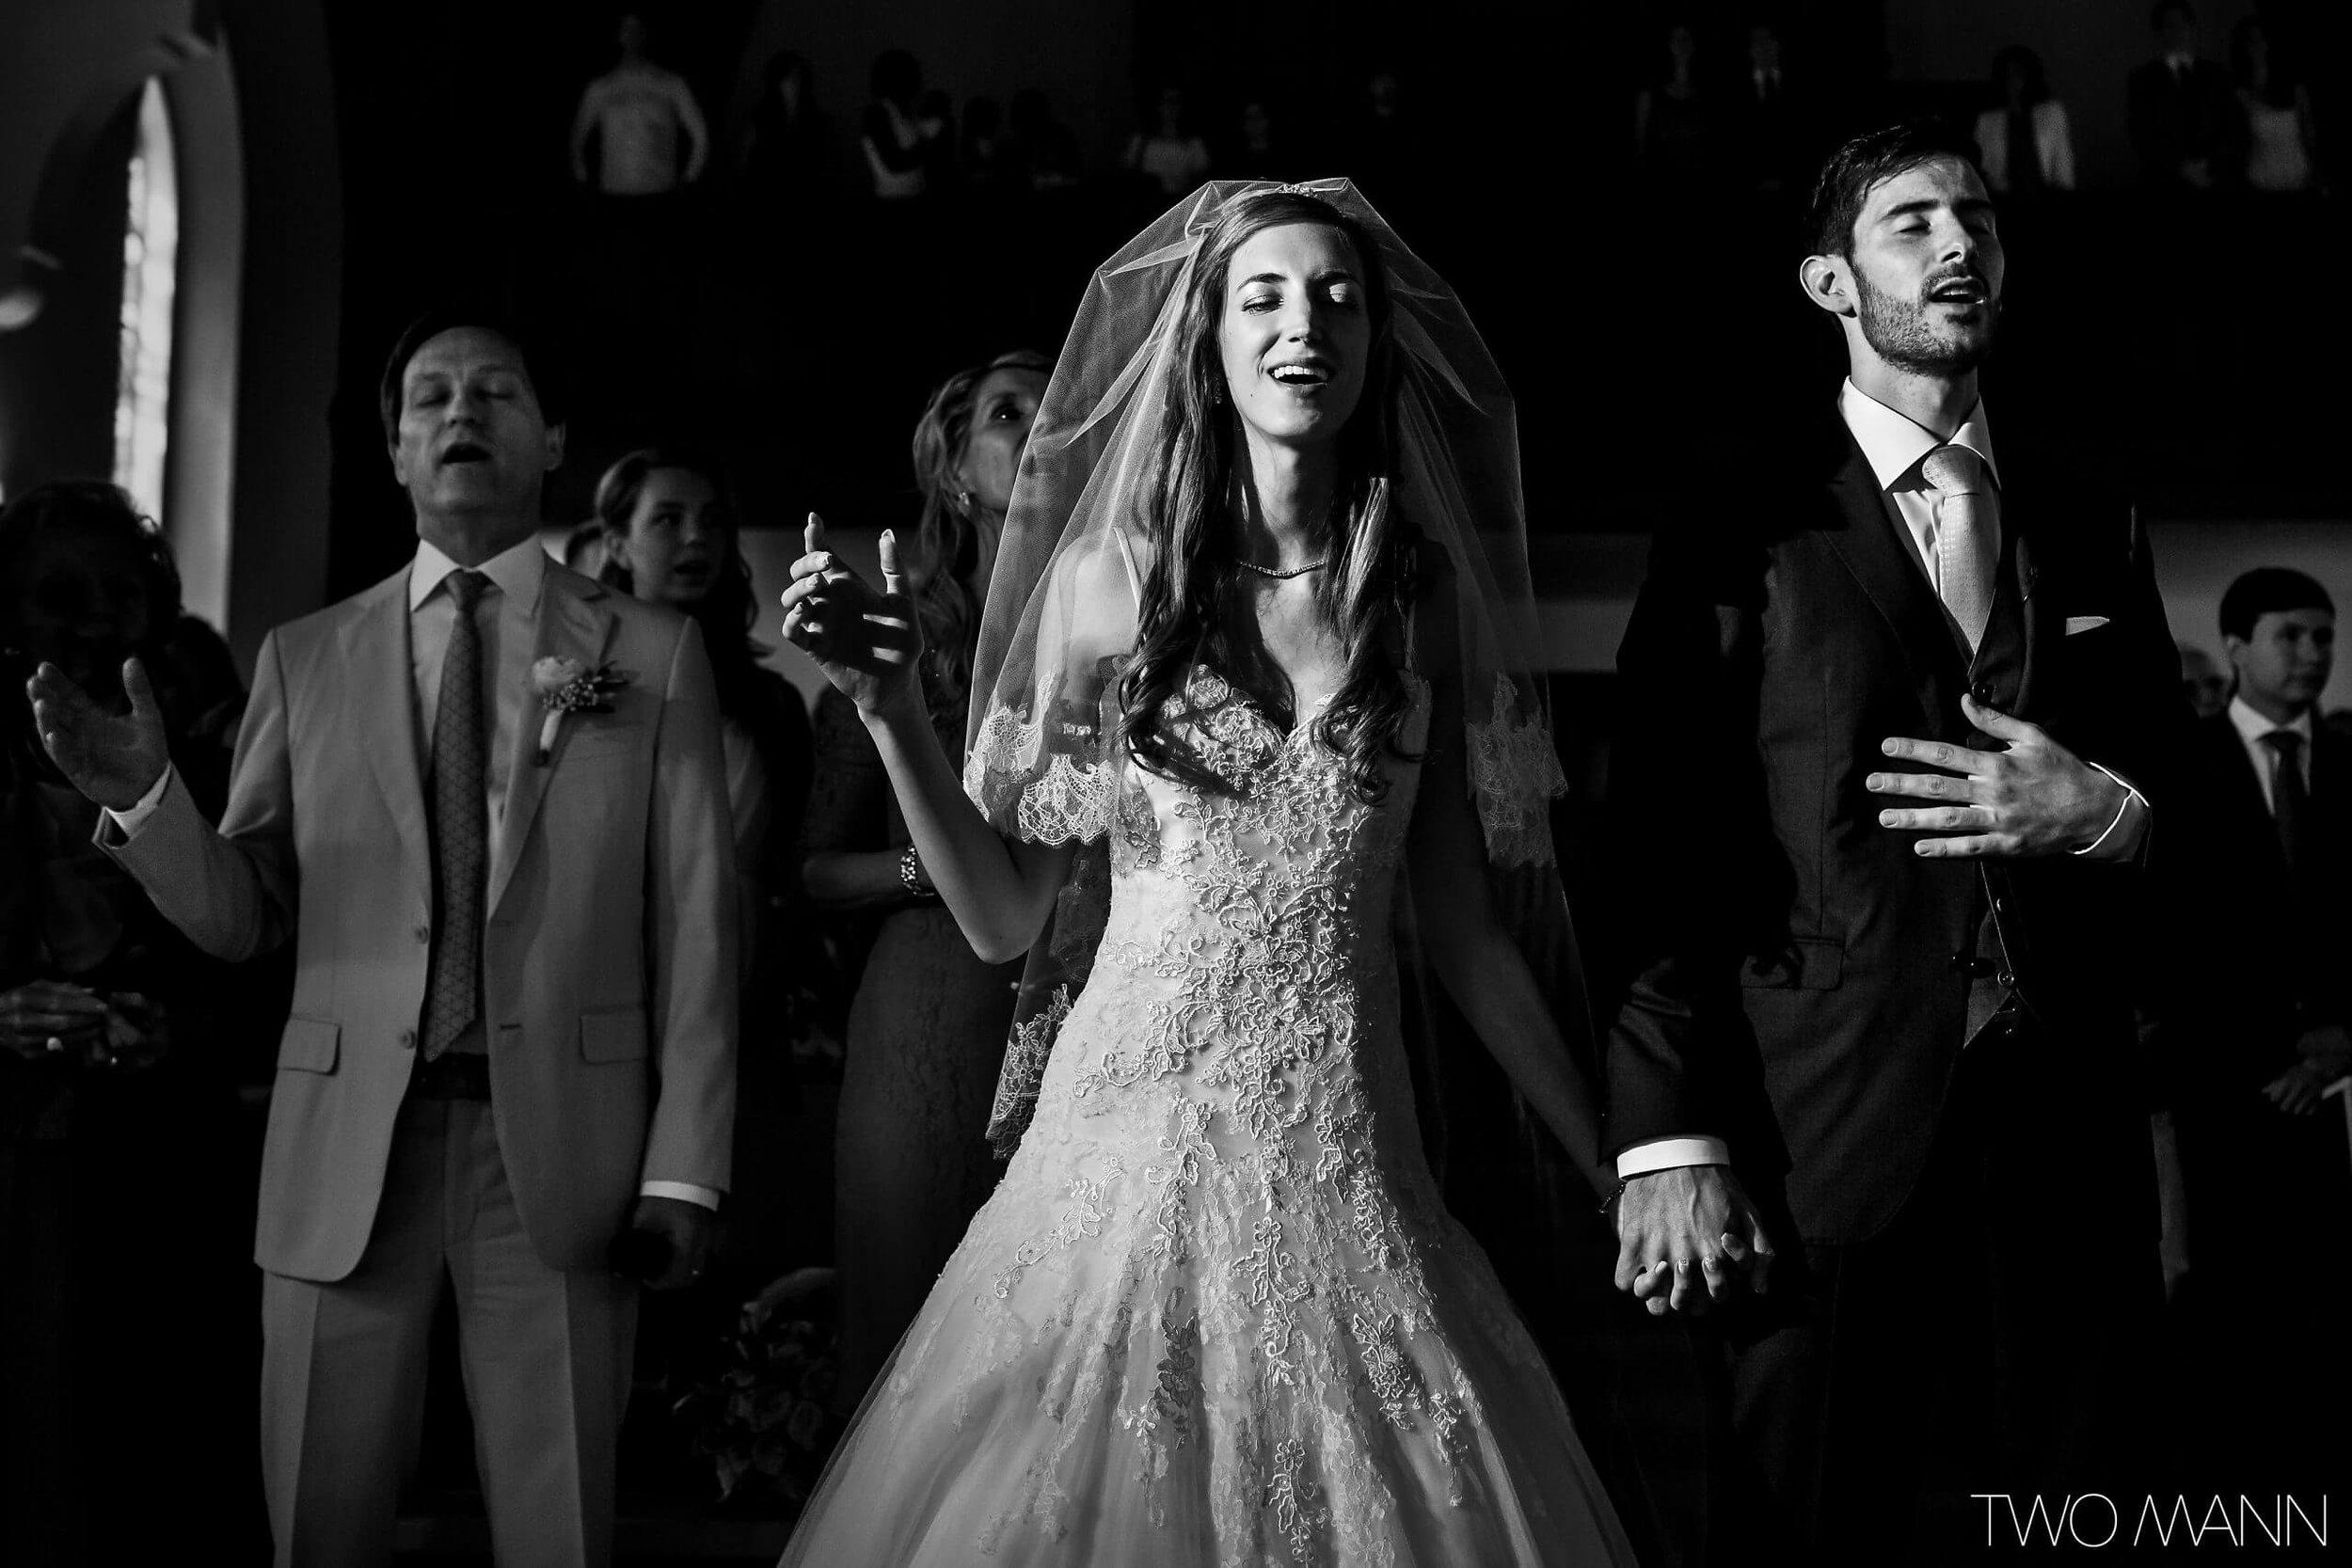 Two-Mann-Studios-Worlds-Best-Wedding-Photography-Best-of-2016-065-2560x1707.jpg